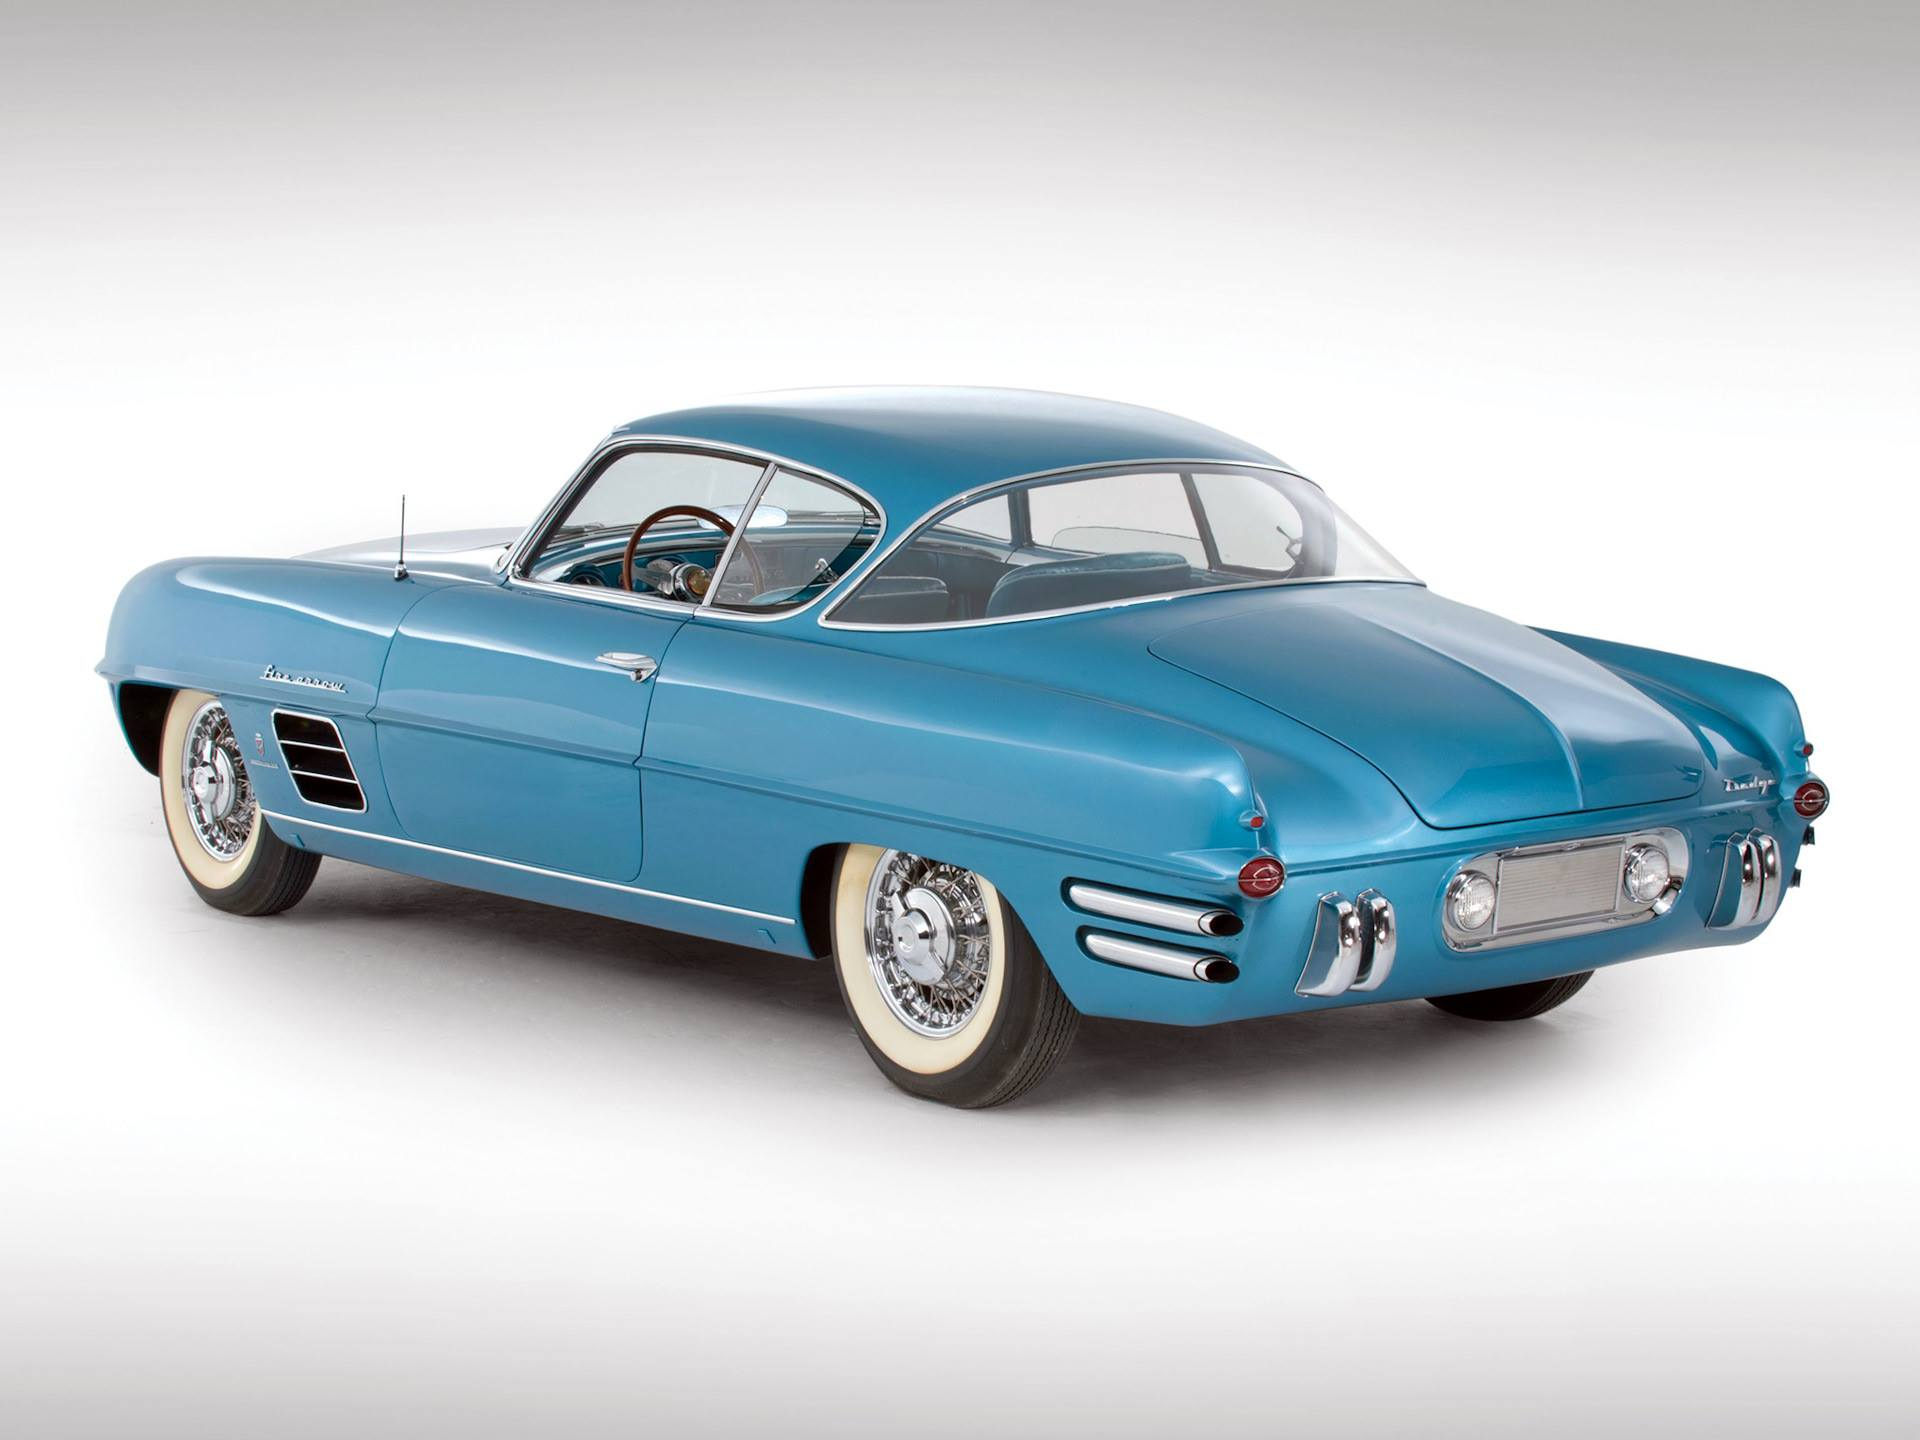 Dodge-Firearrow-III-Sport-Coupe-1954-2